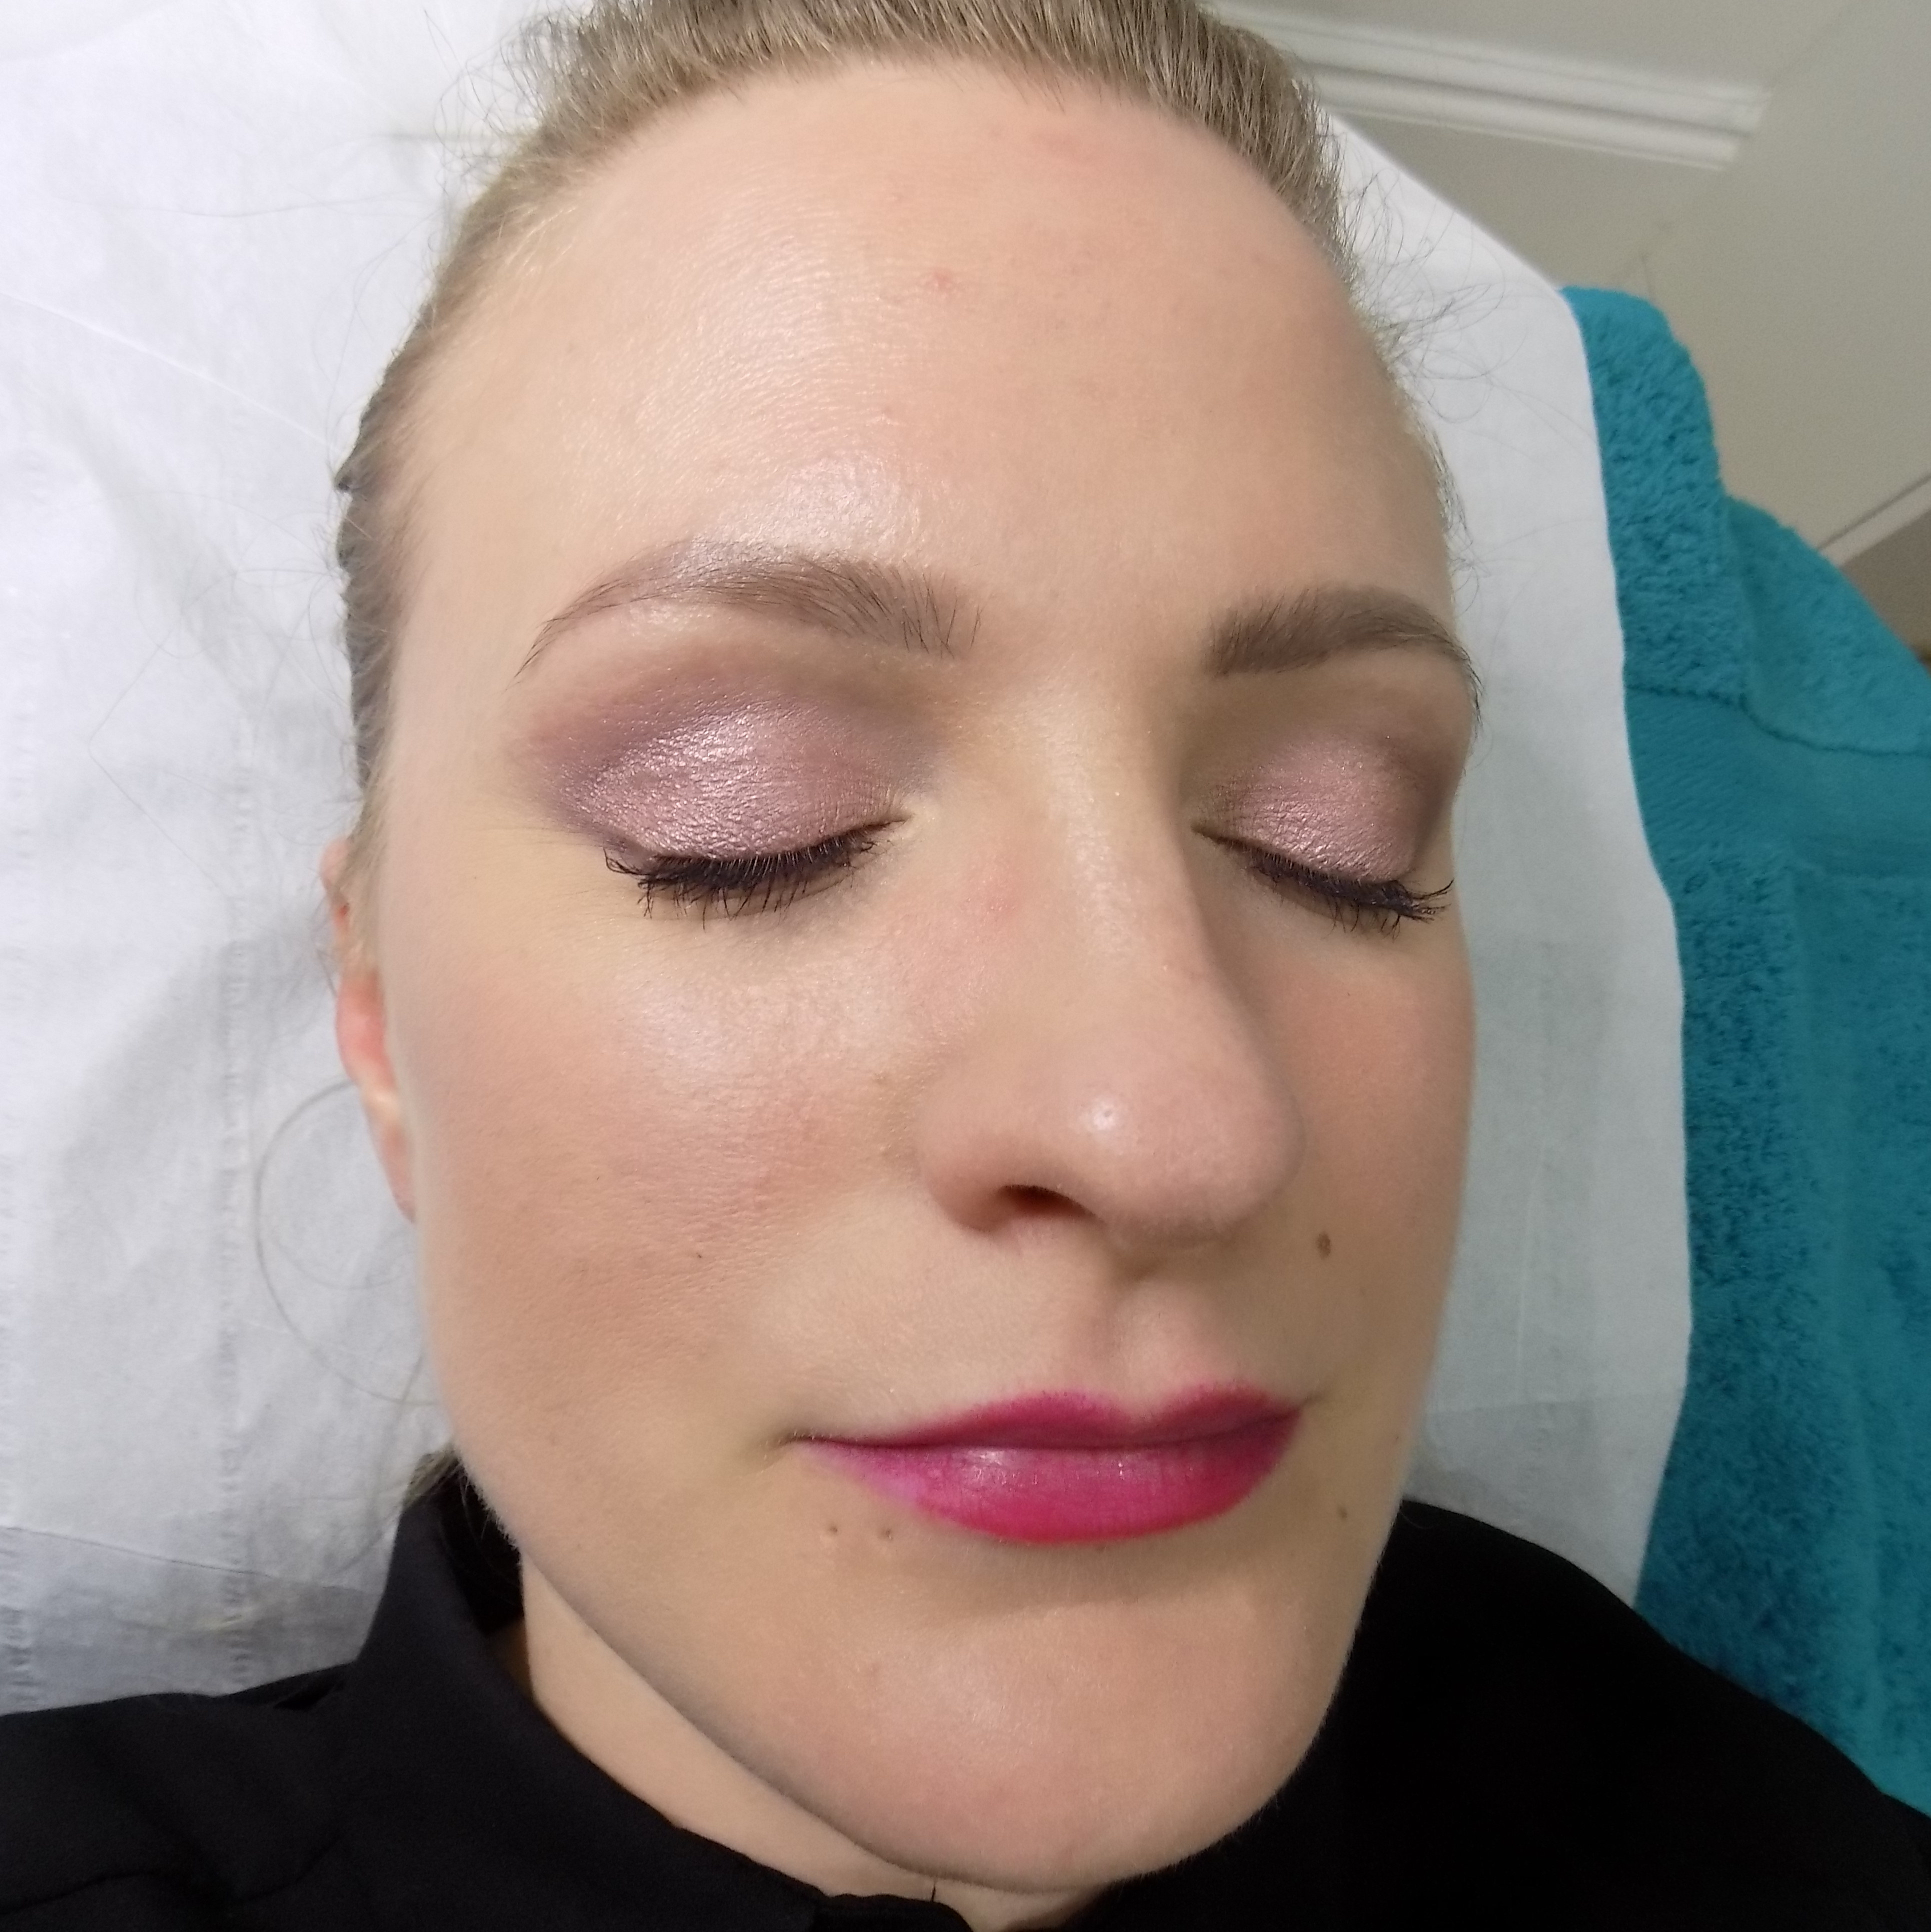 Skinbreeze CACI facial review for rosacea-prone skin - Talonted Lex